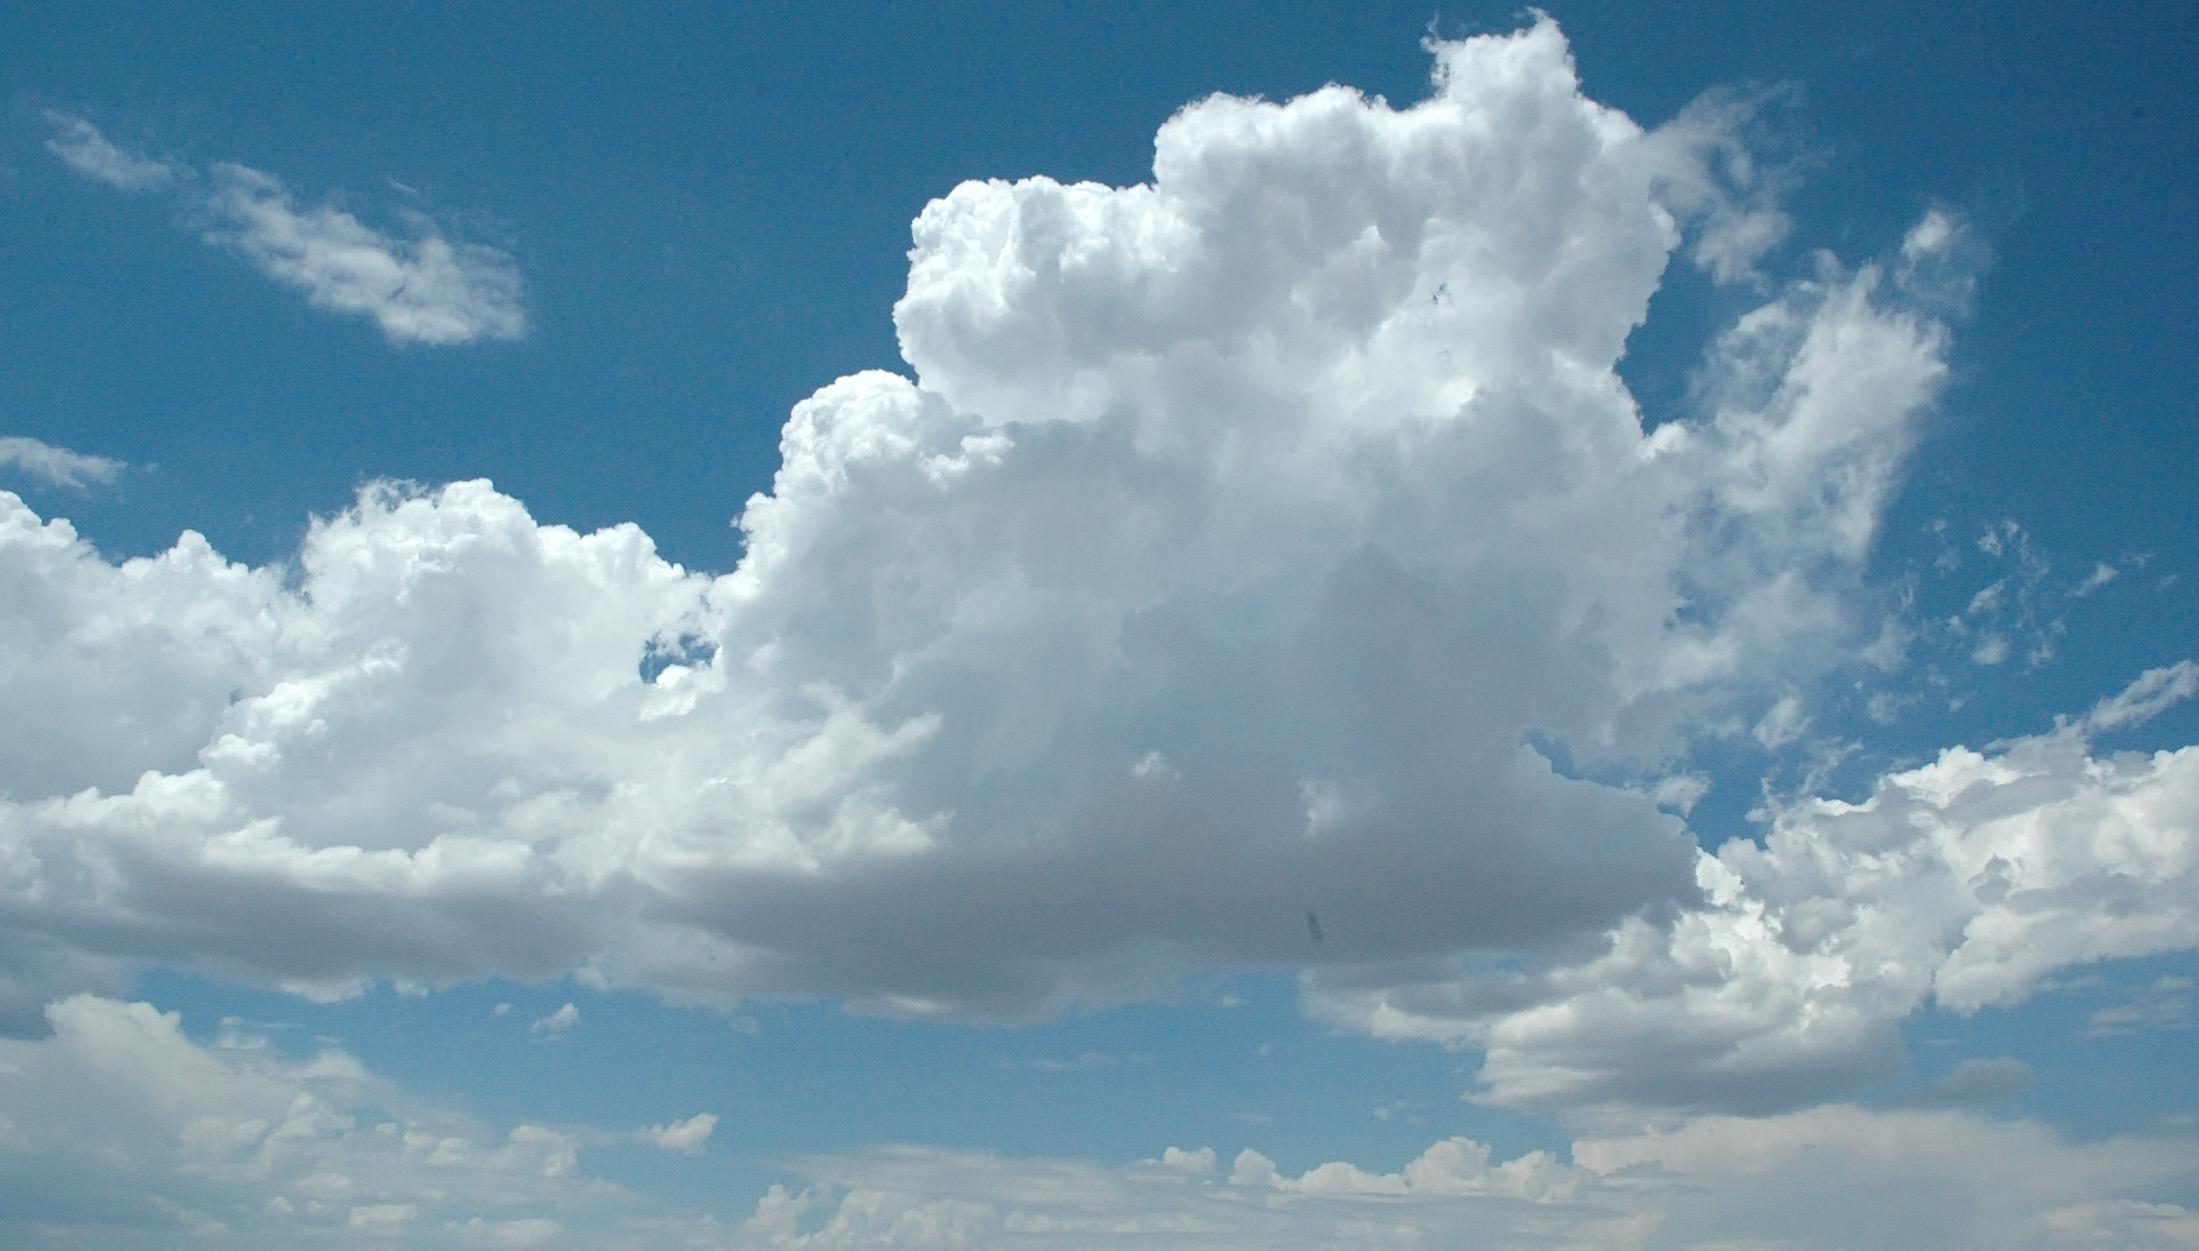 http://www.we-r-here.com/cad_08/tutorials/level_3/images/sky.jpg